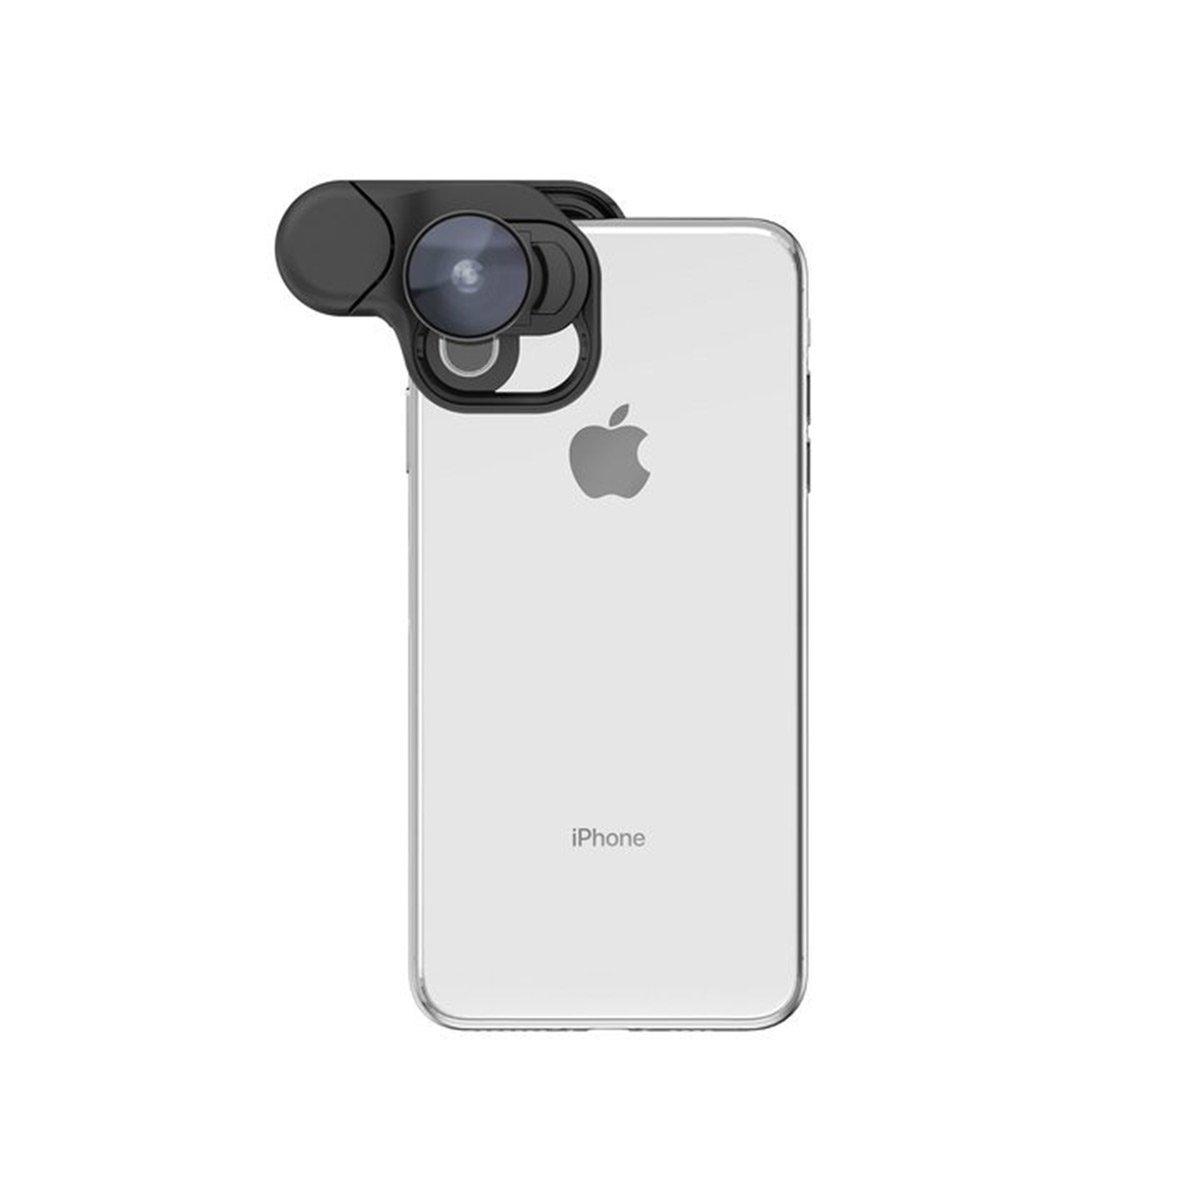 c6908a9d498fac iPhone XS Max Olloclip Fisheye, Super-Wide, and Macro Lens | PicxTrix